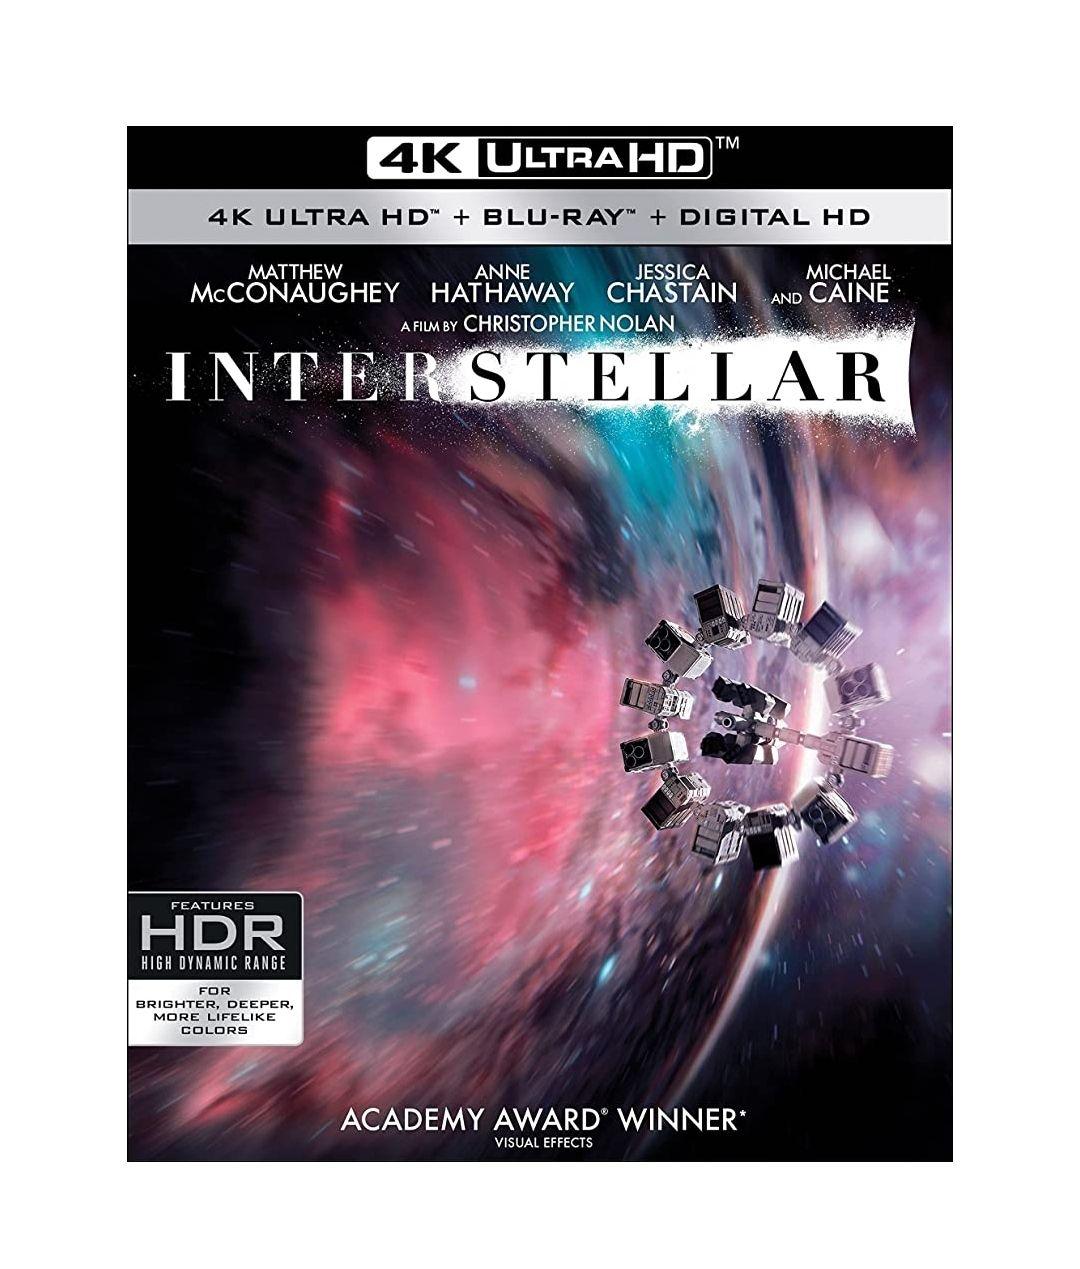 Amazon: Interestelar formato físico 4k | Edición con 3 discos | Envío gratis con Prime | $394.30